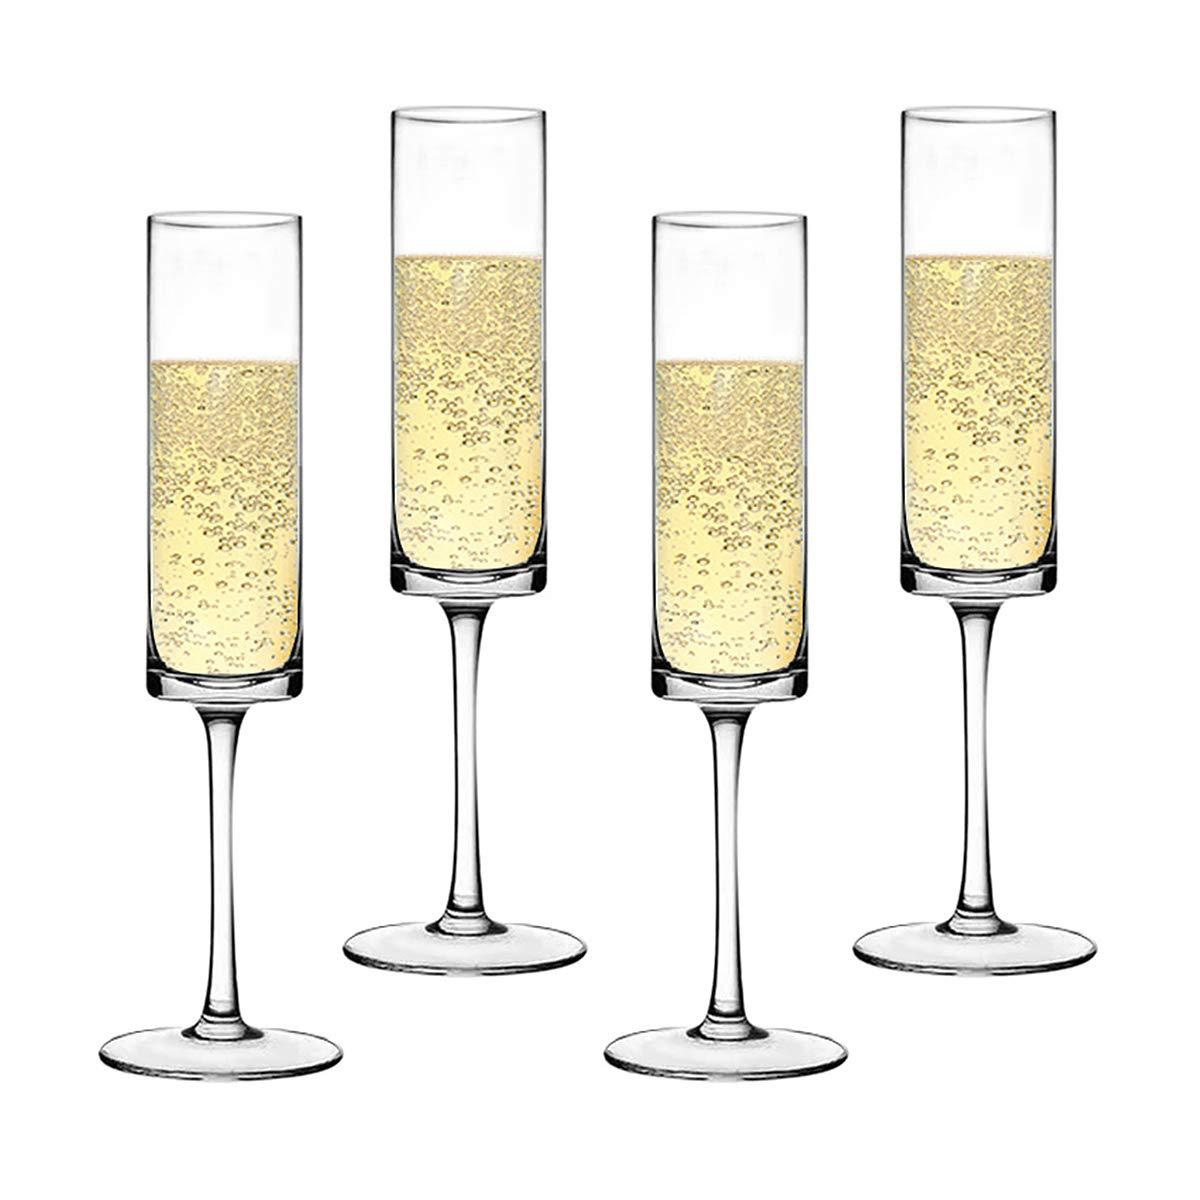 Premium Crystal Champagne Flute Glasses Elegantly Designed Hand Blown Champagne Glasses, Lead Free, Set of 4